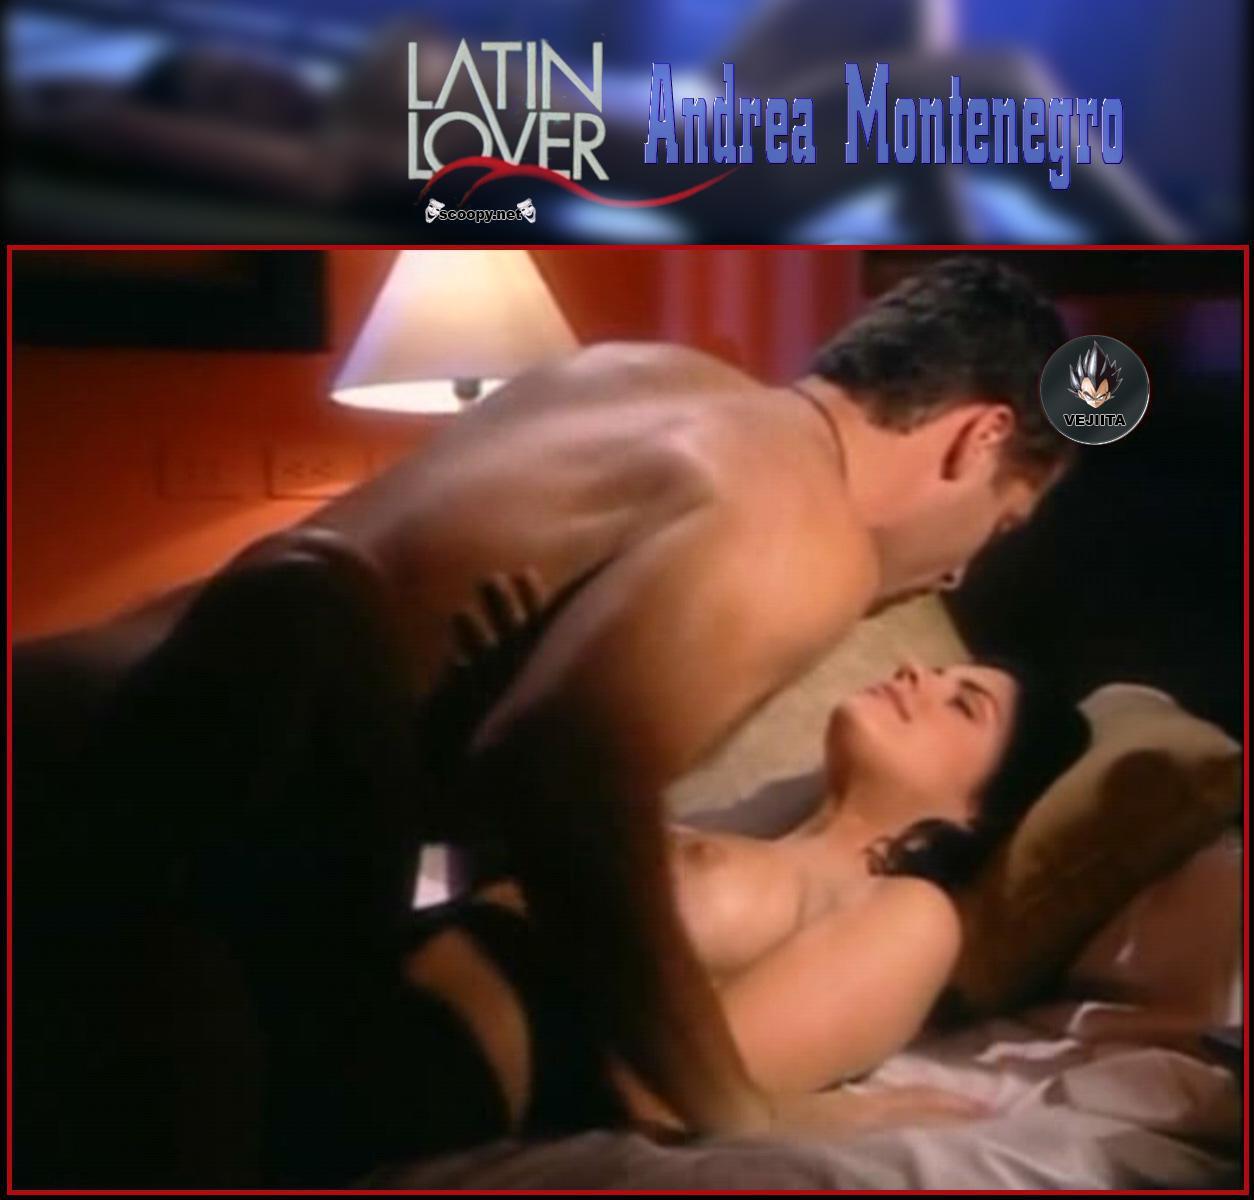 best scene latin lover andrea montenegro Vido porno en